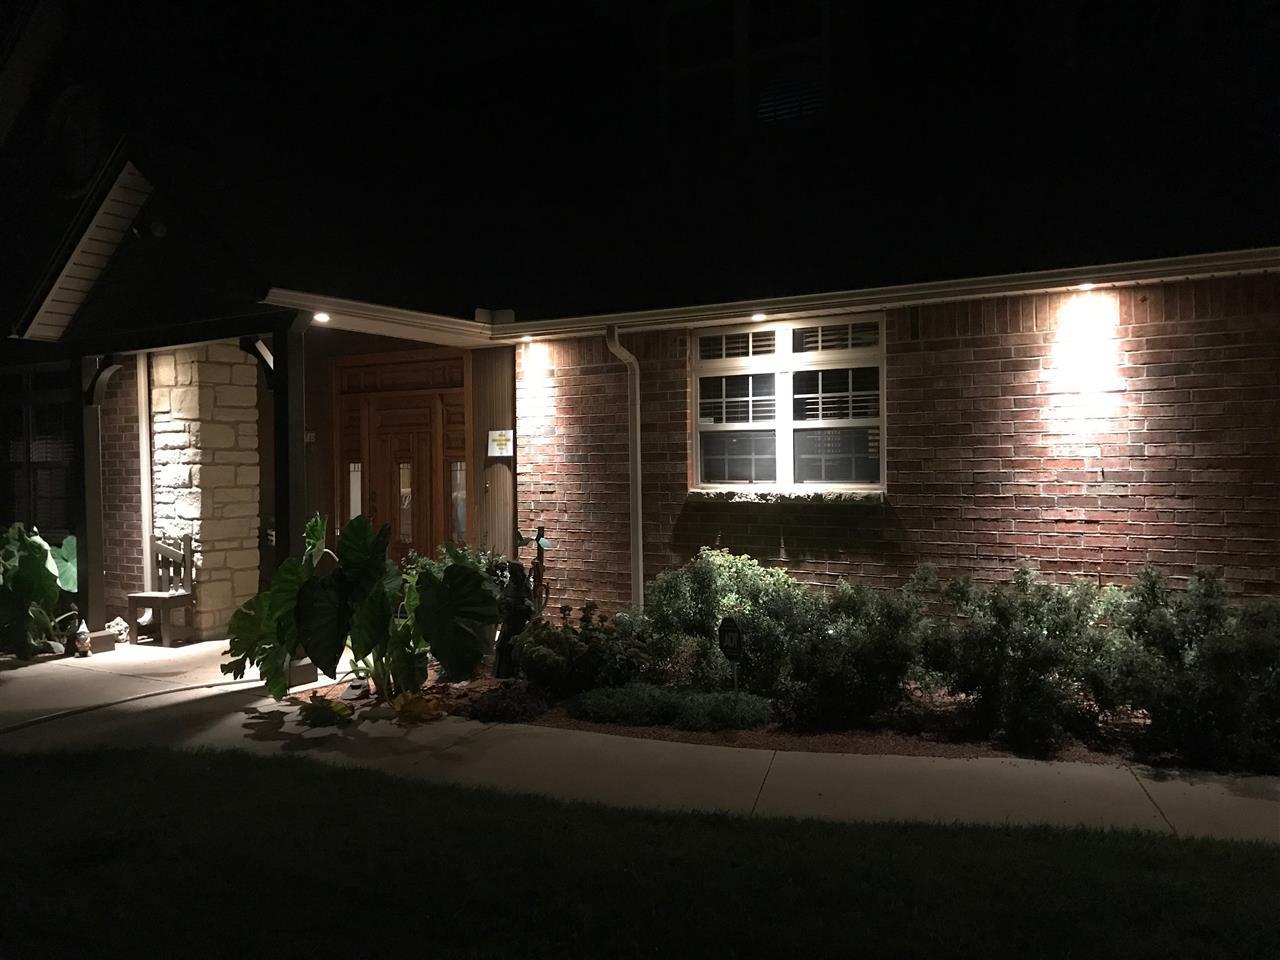 #century21groupone,#homesforsaleponcacity,#poncacityrealestate | 4251 N Union Ponca City, OK 74604 5